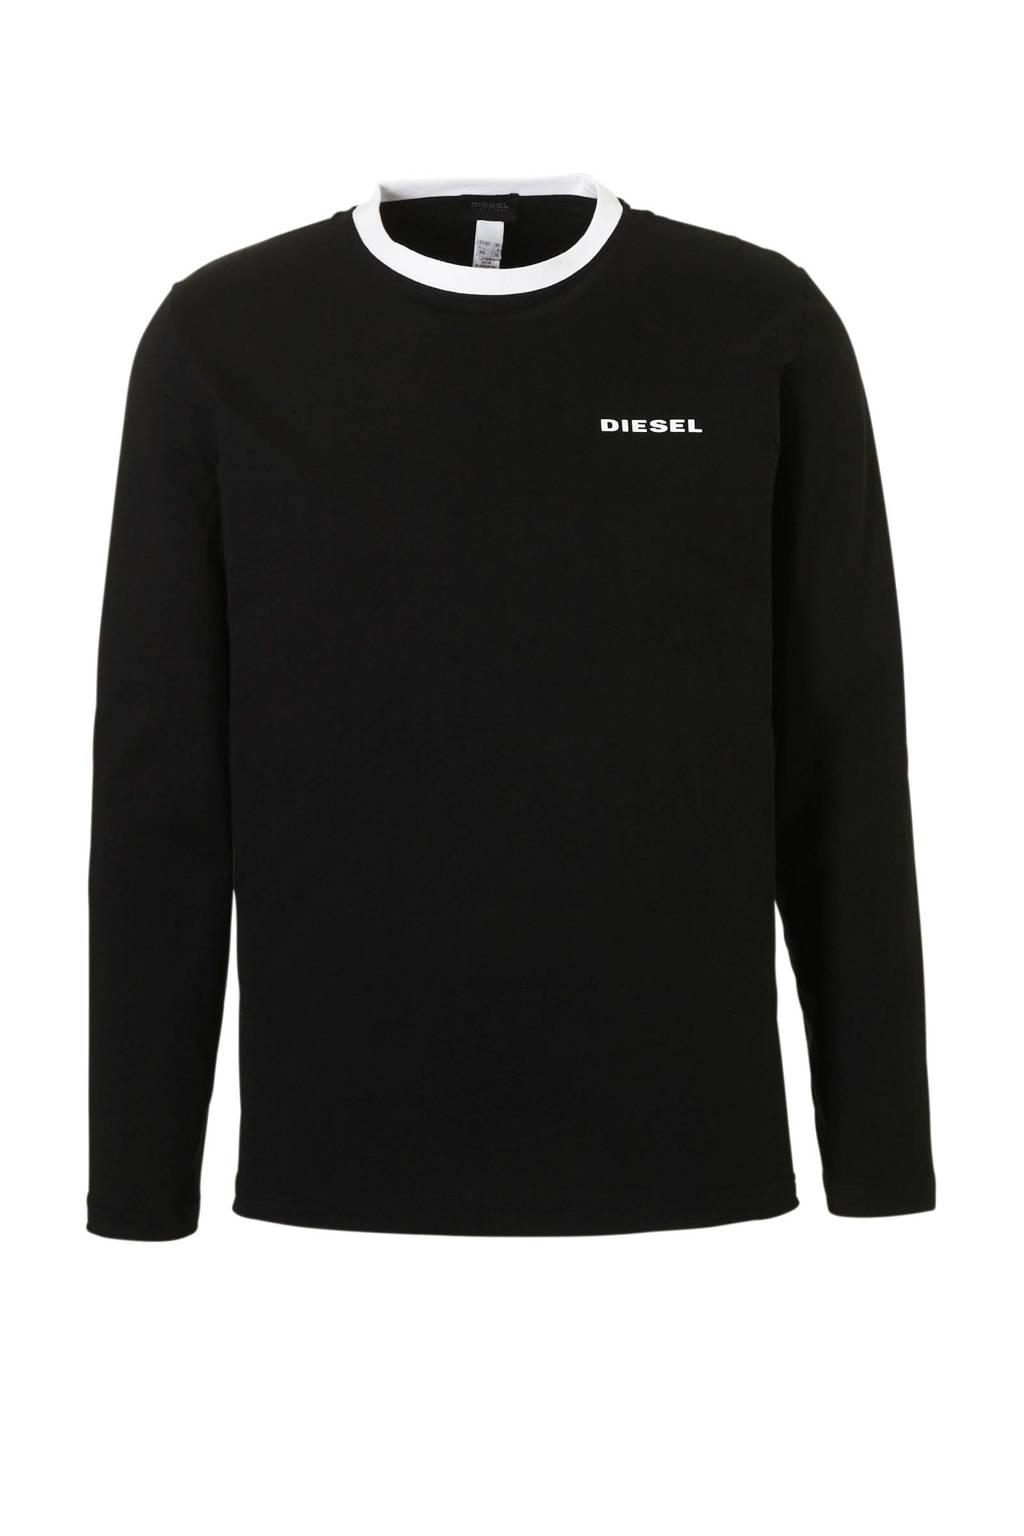 Diesel katoenen t-shirt zwart, Zwart/wit